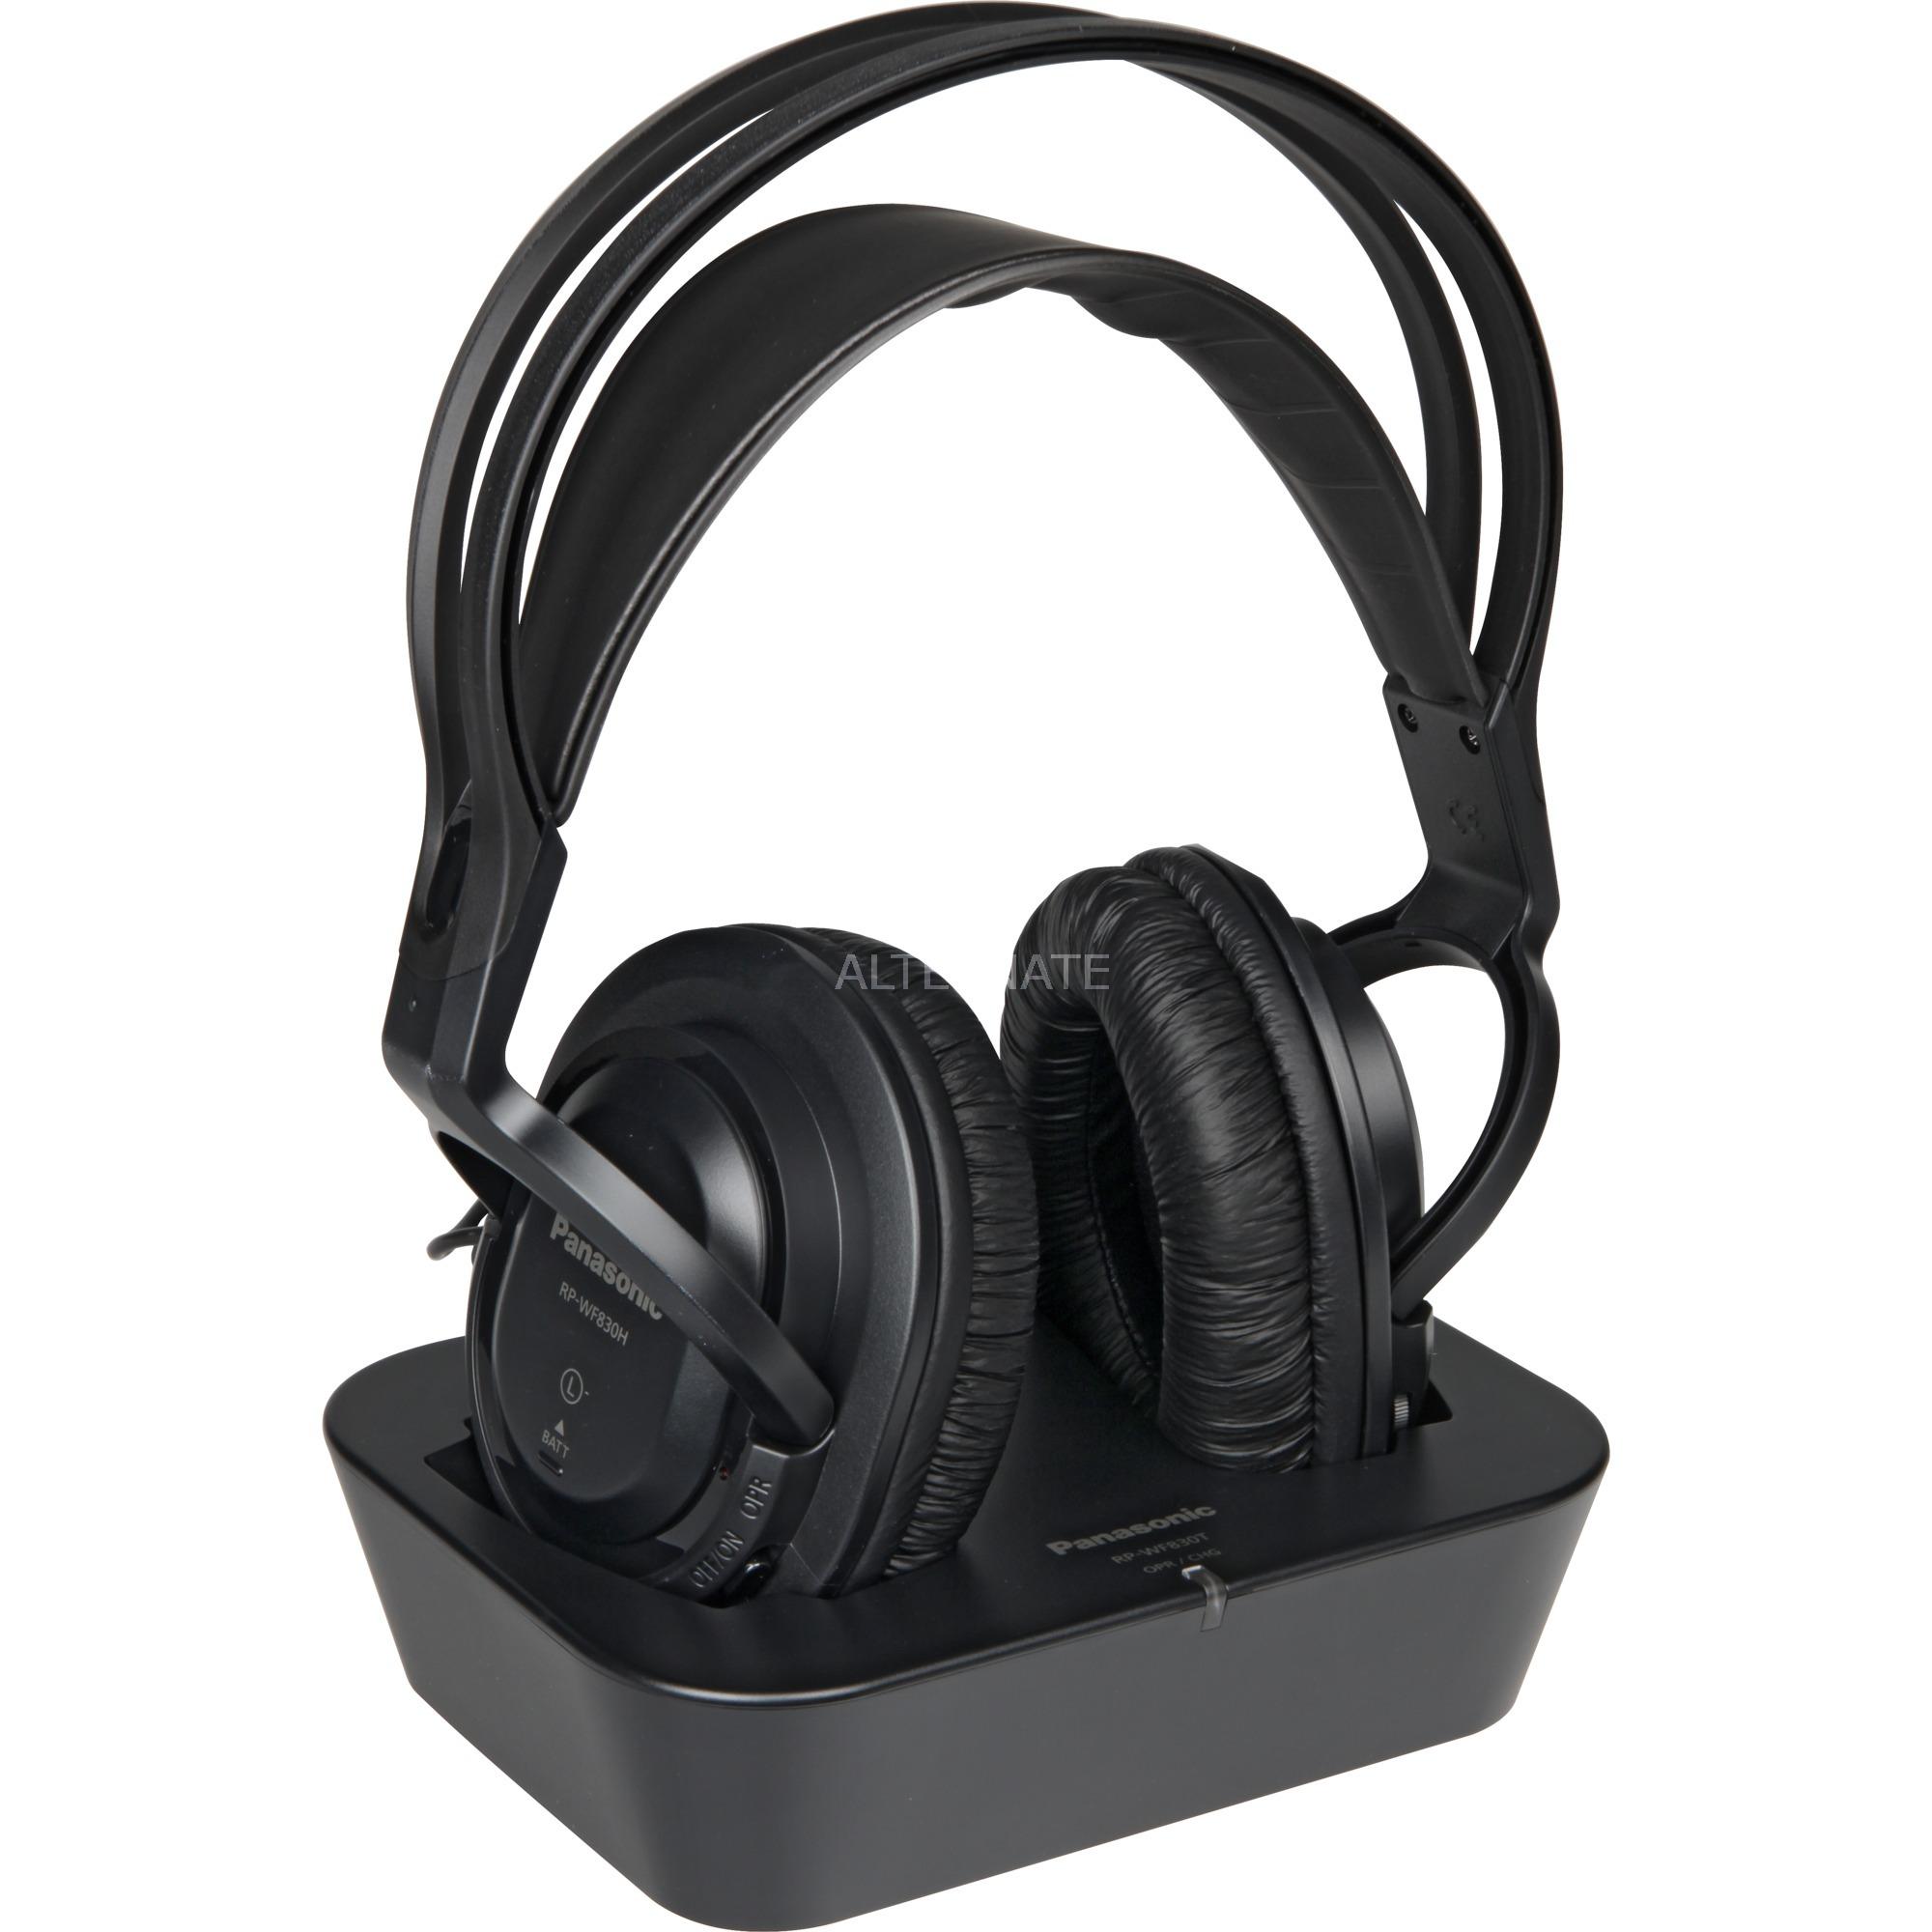 RP-WF830E Negro Circumaural Diadema auricular, Auriculares